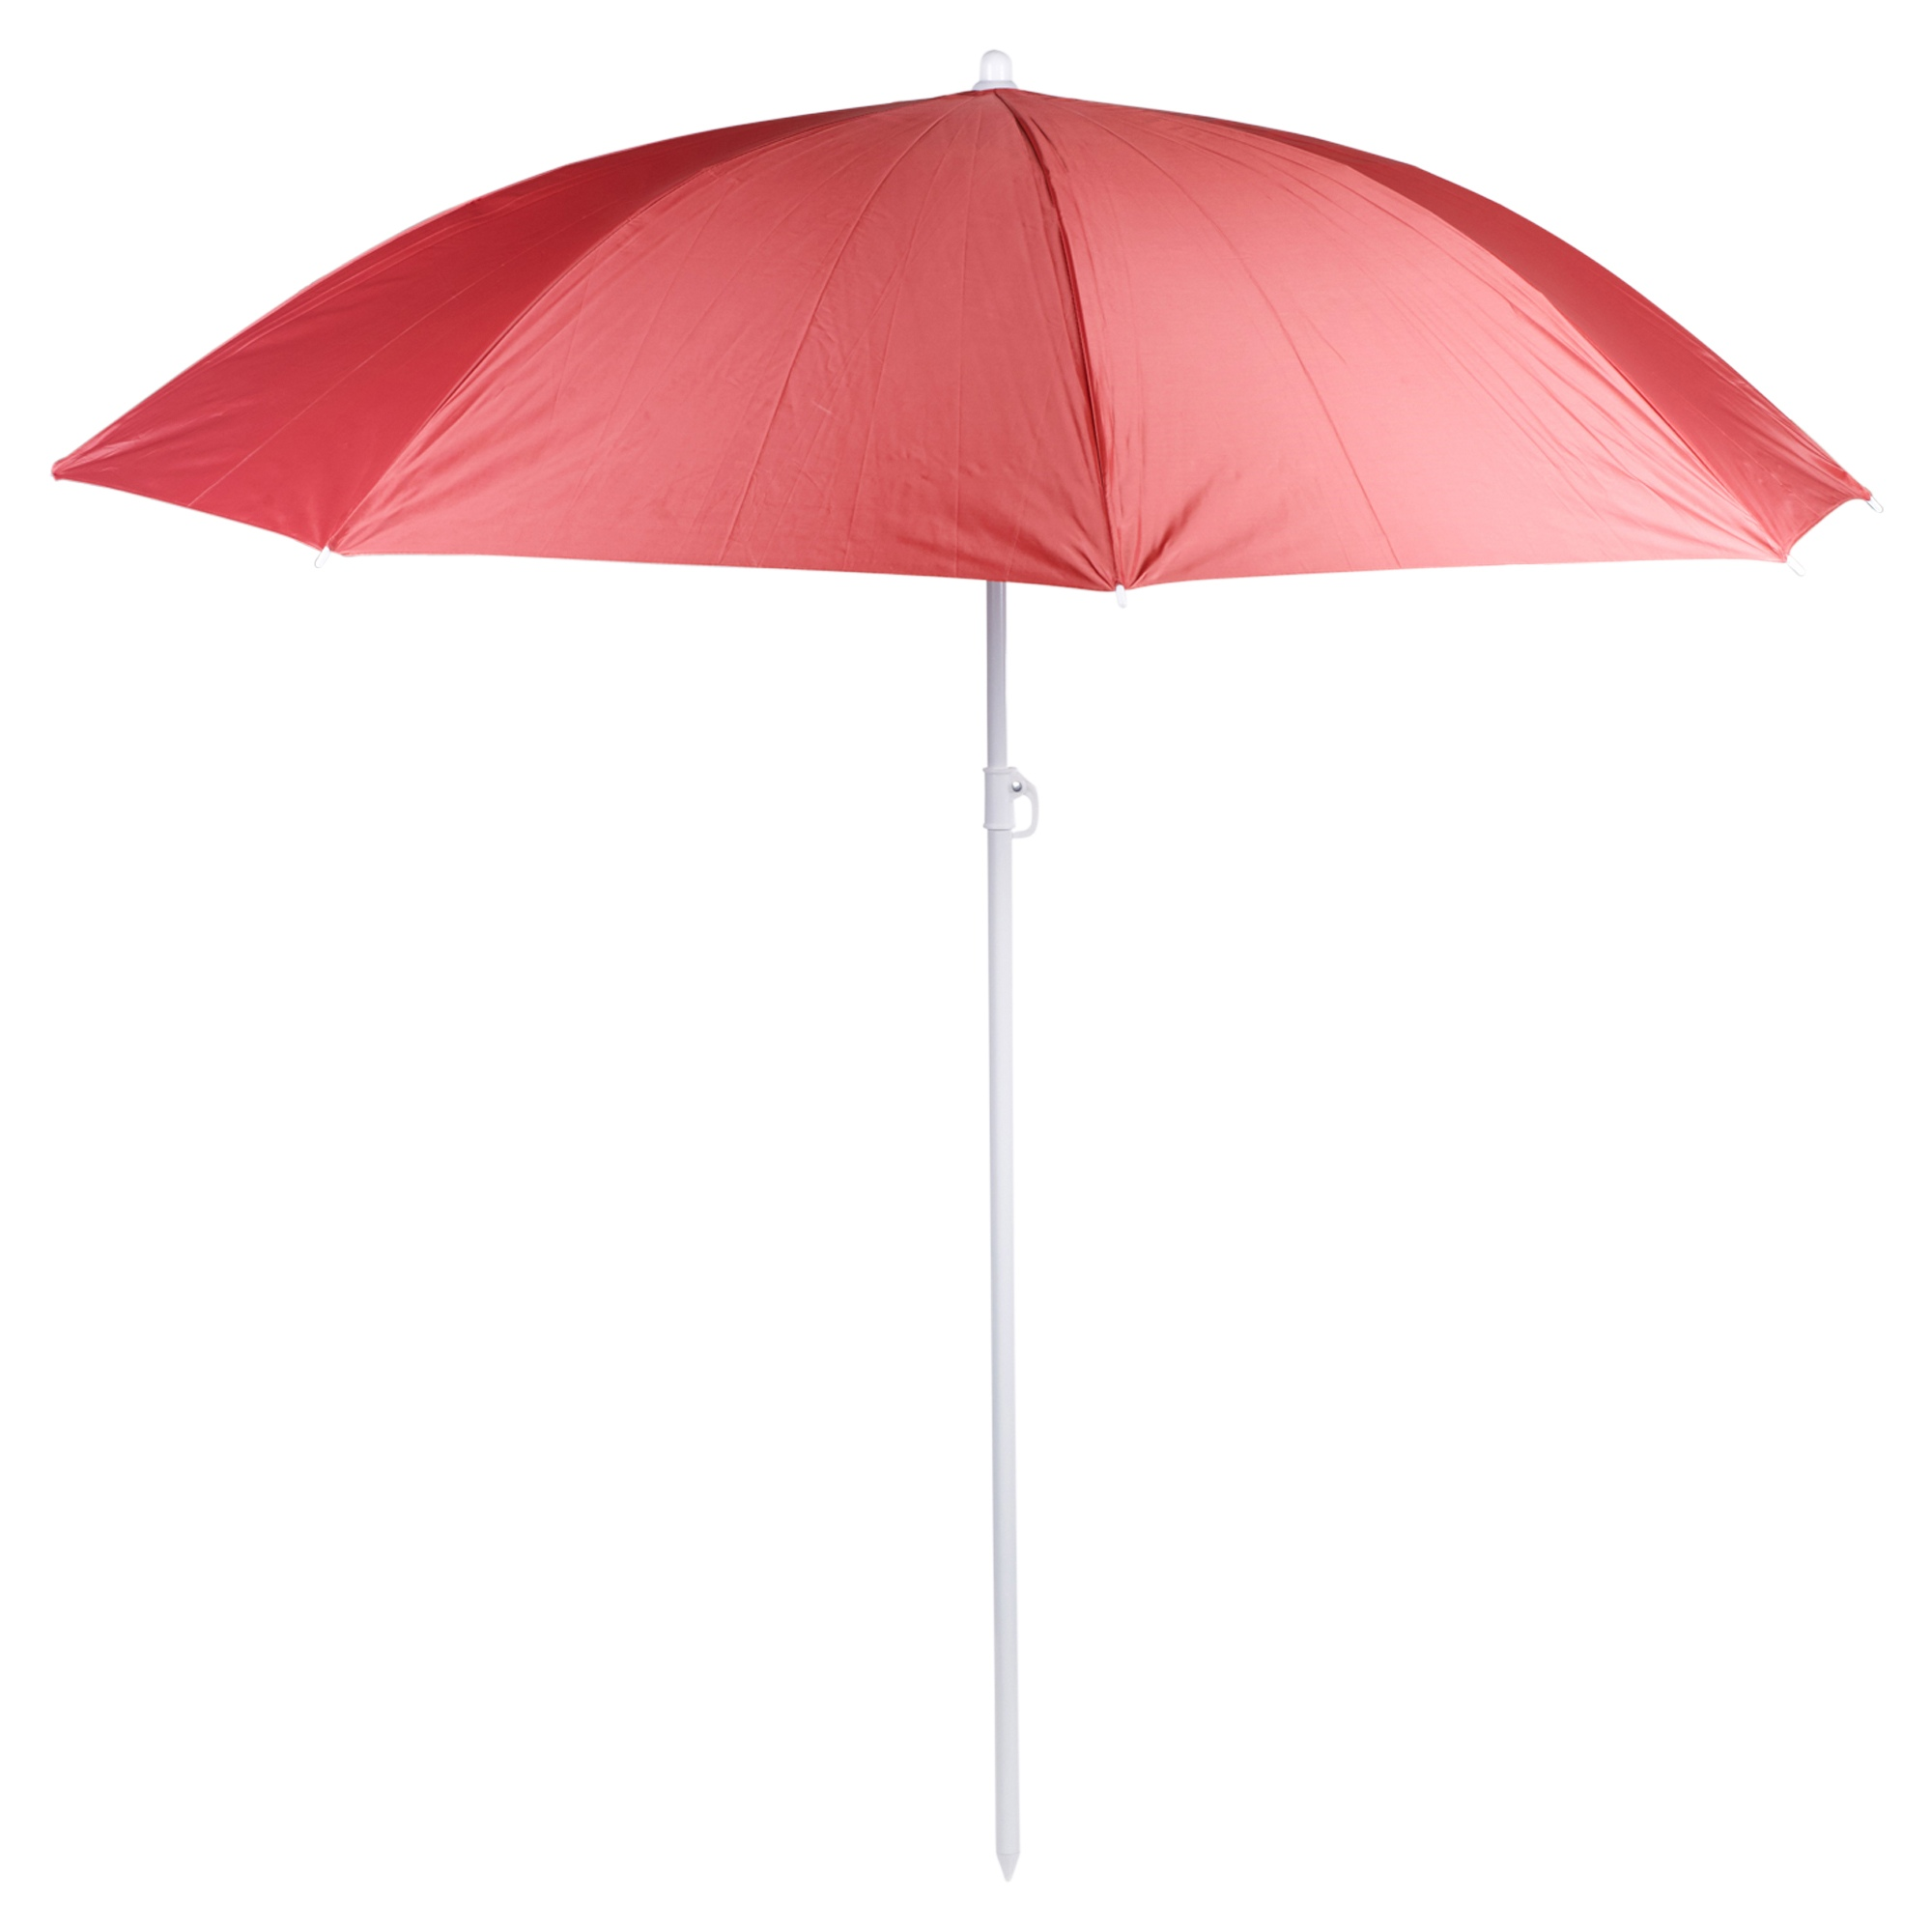 1 9m grand soleil parapluie parasol jardin plage pont. Black Bedroom Furniture Sets. Home Design Ideas